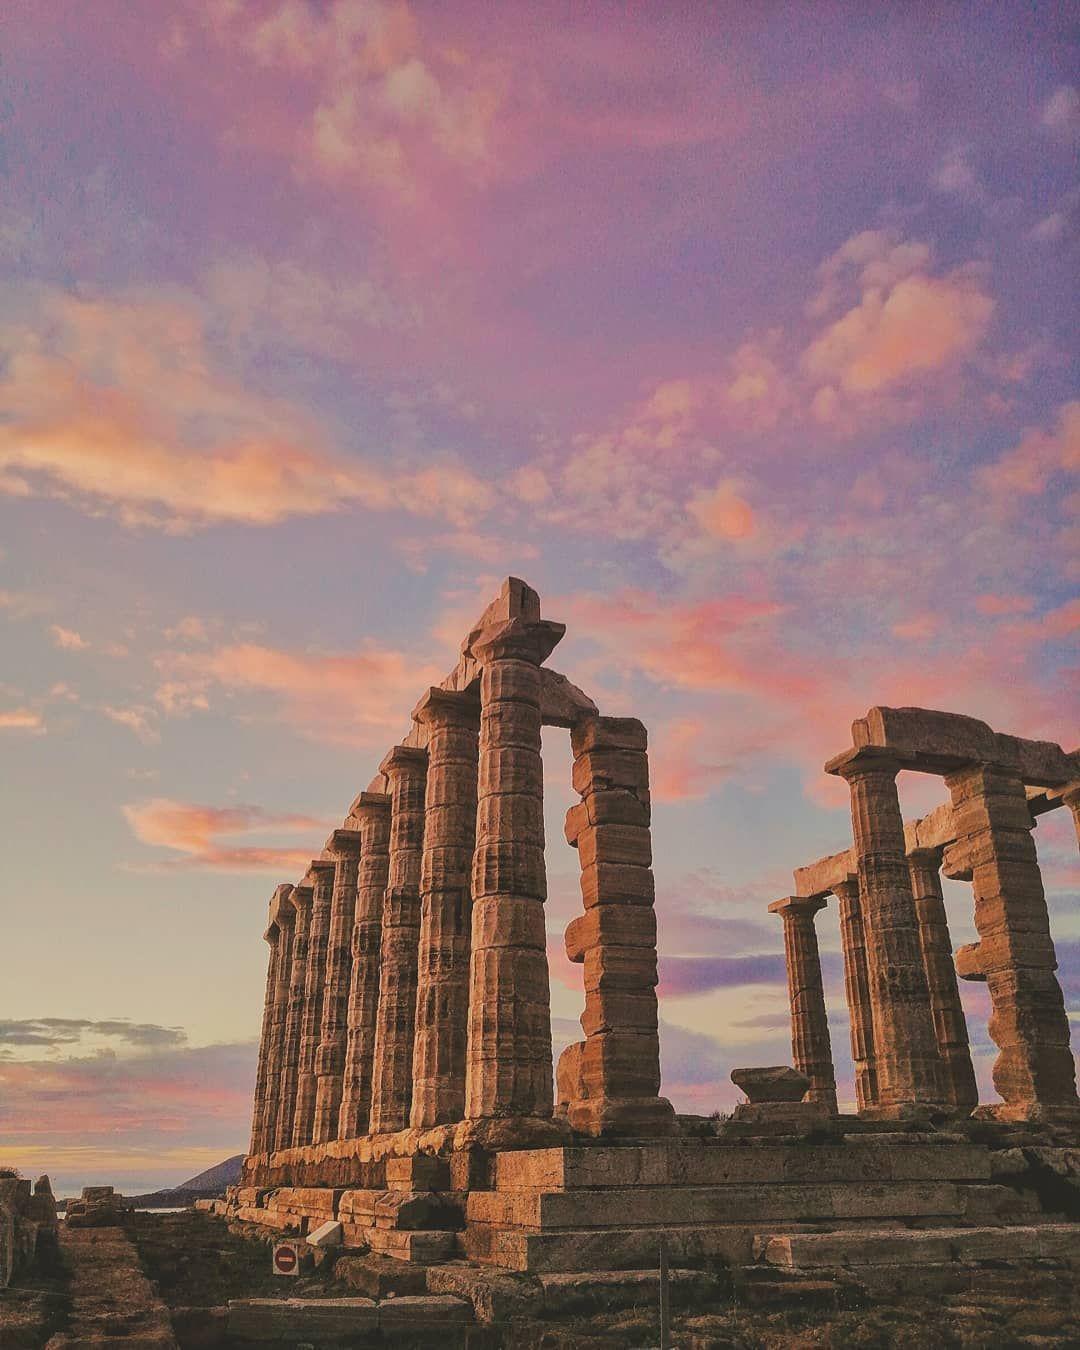 08e6c1541a  poseidon  temple  capesounion  ictinus  ancient  greece  archeology  myths   legends  sadstories  kingaegeus  theseus…